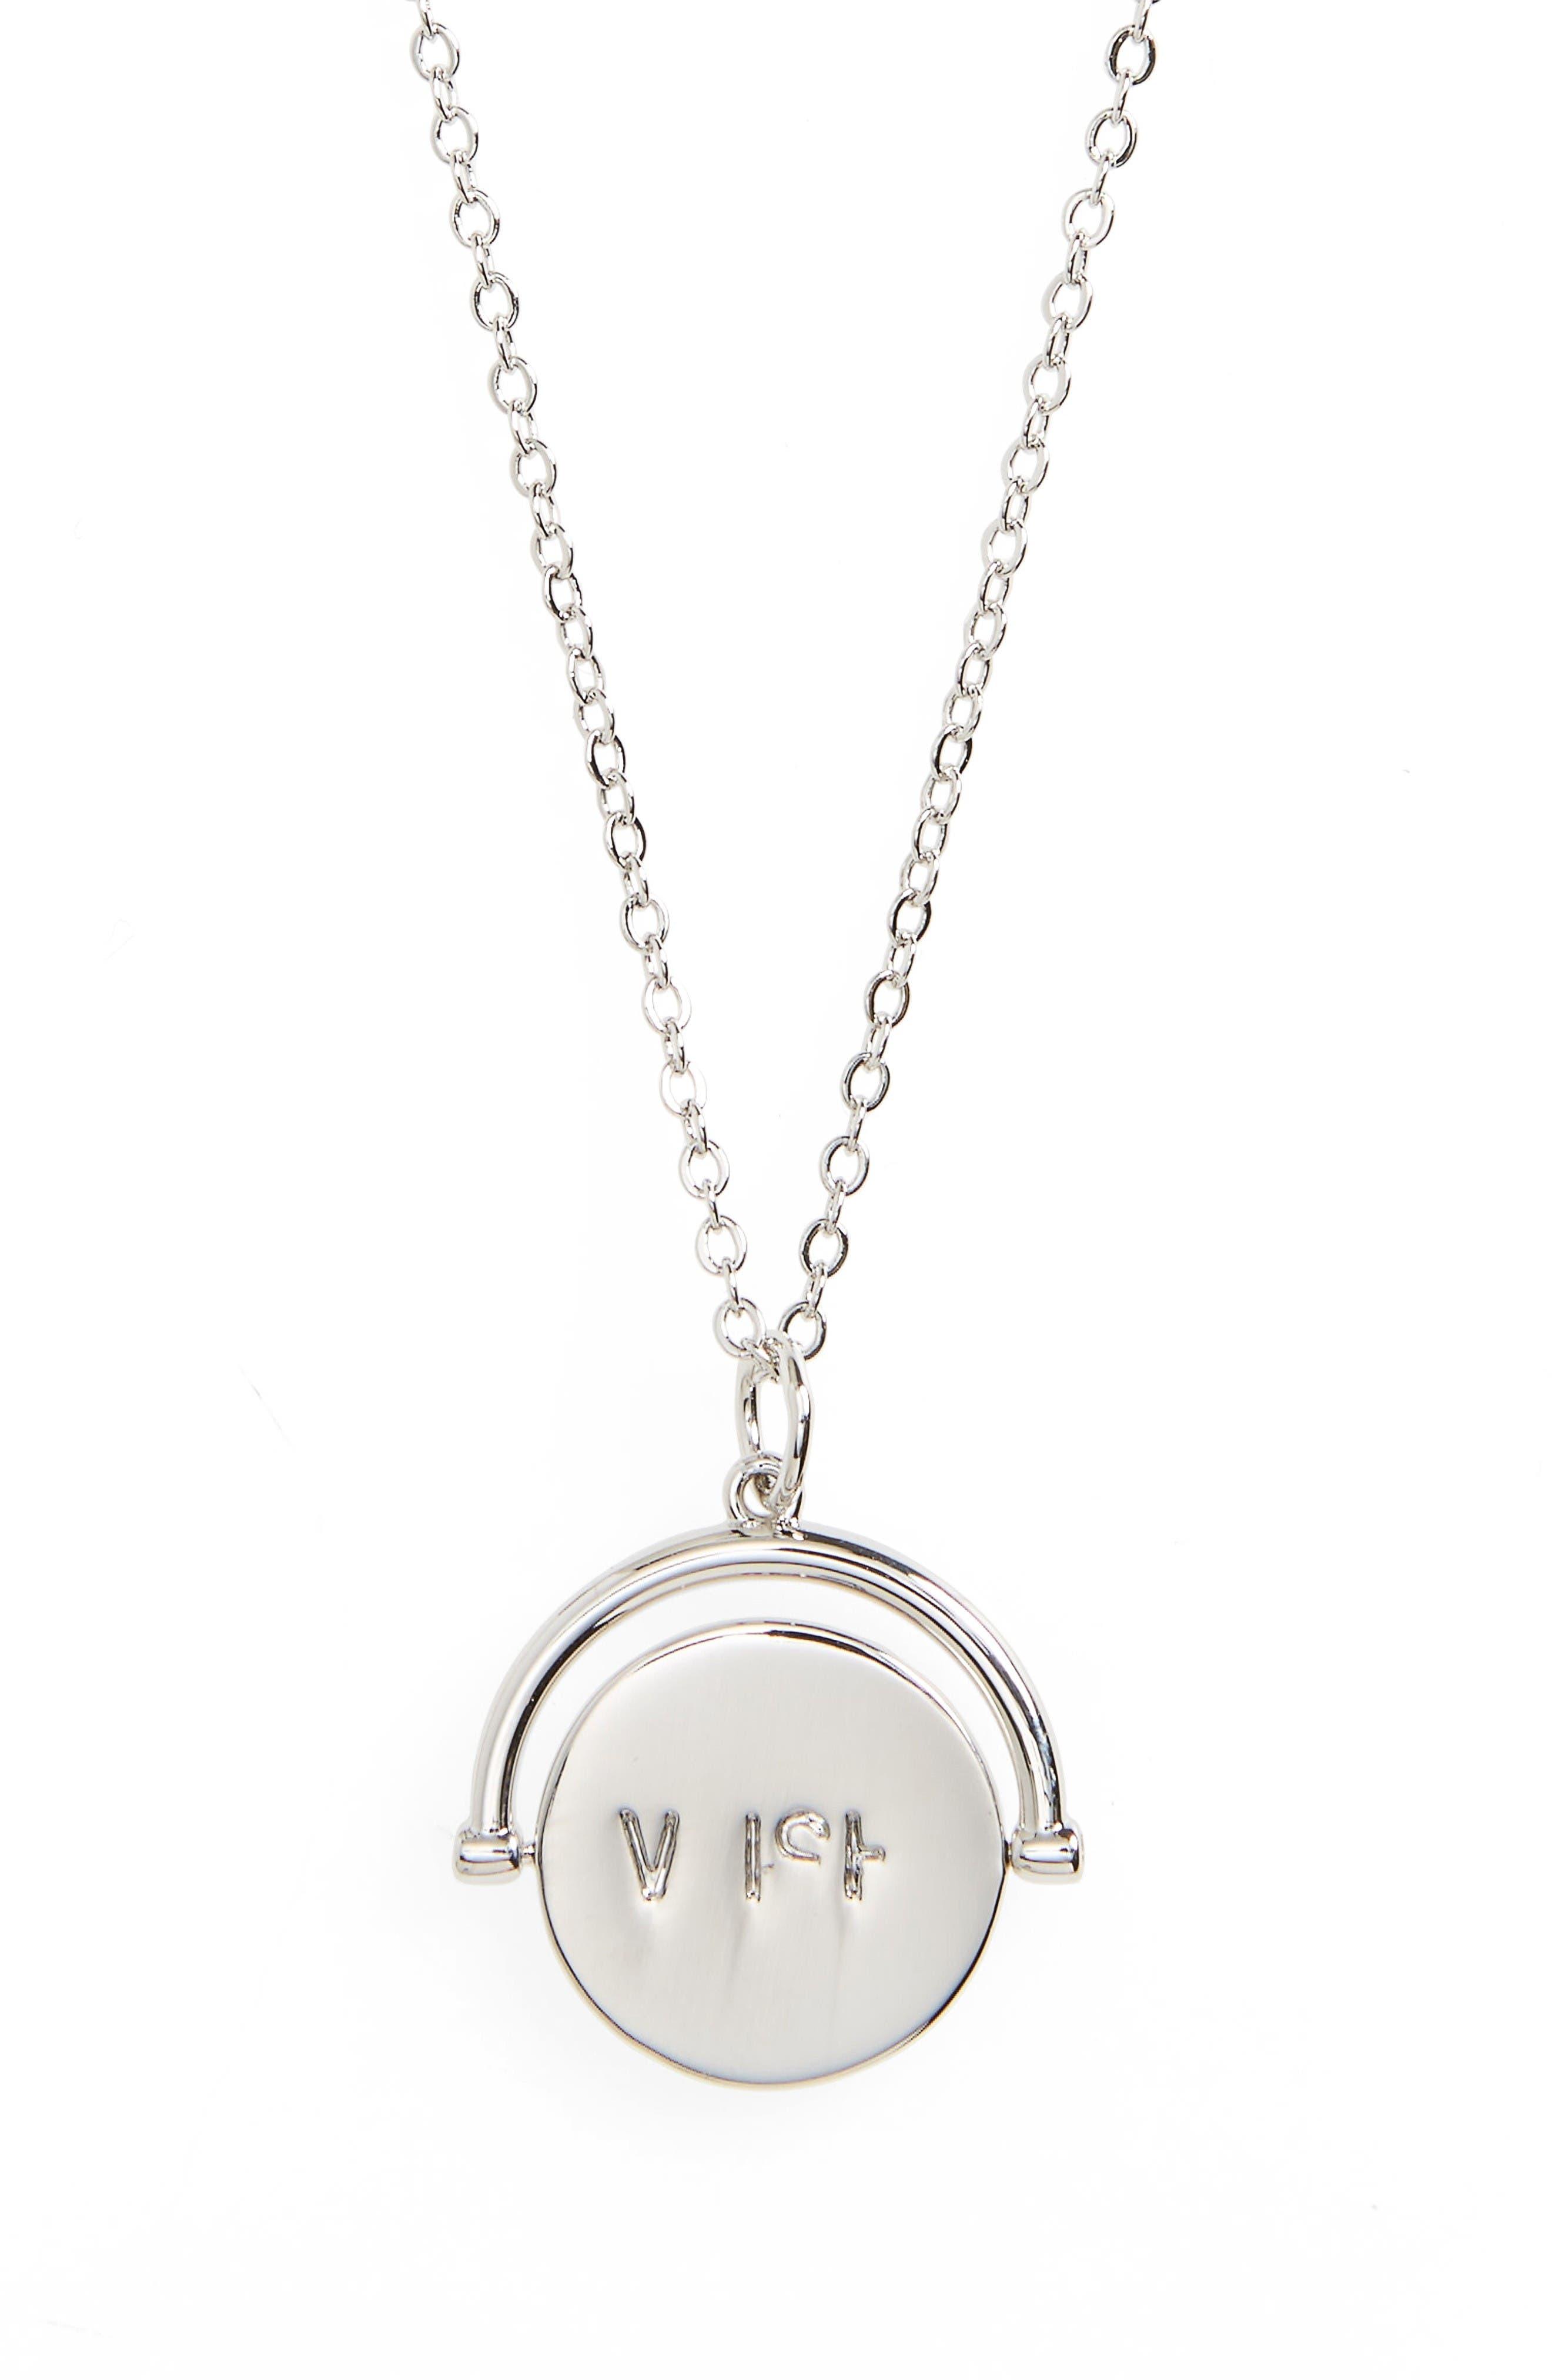 Main Image - Lulu DK Wish Love Code Charm Necklace